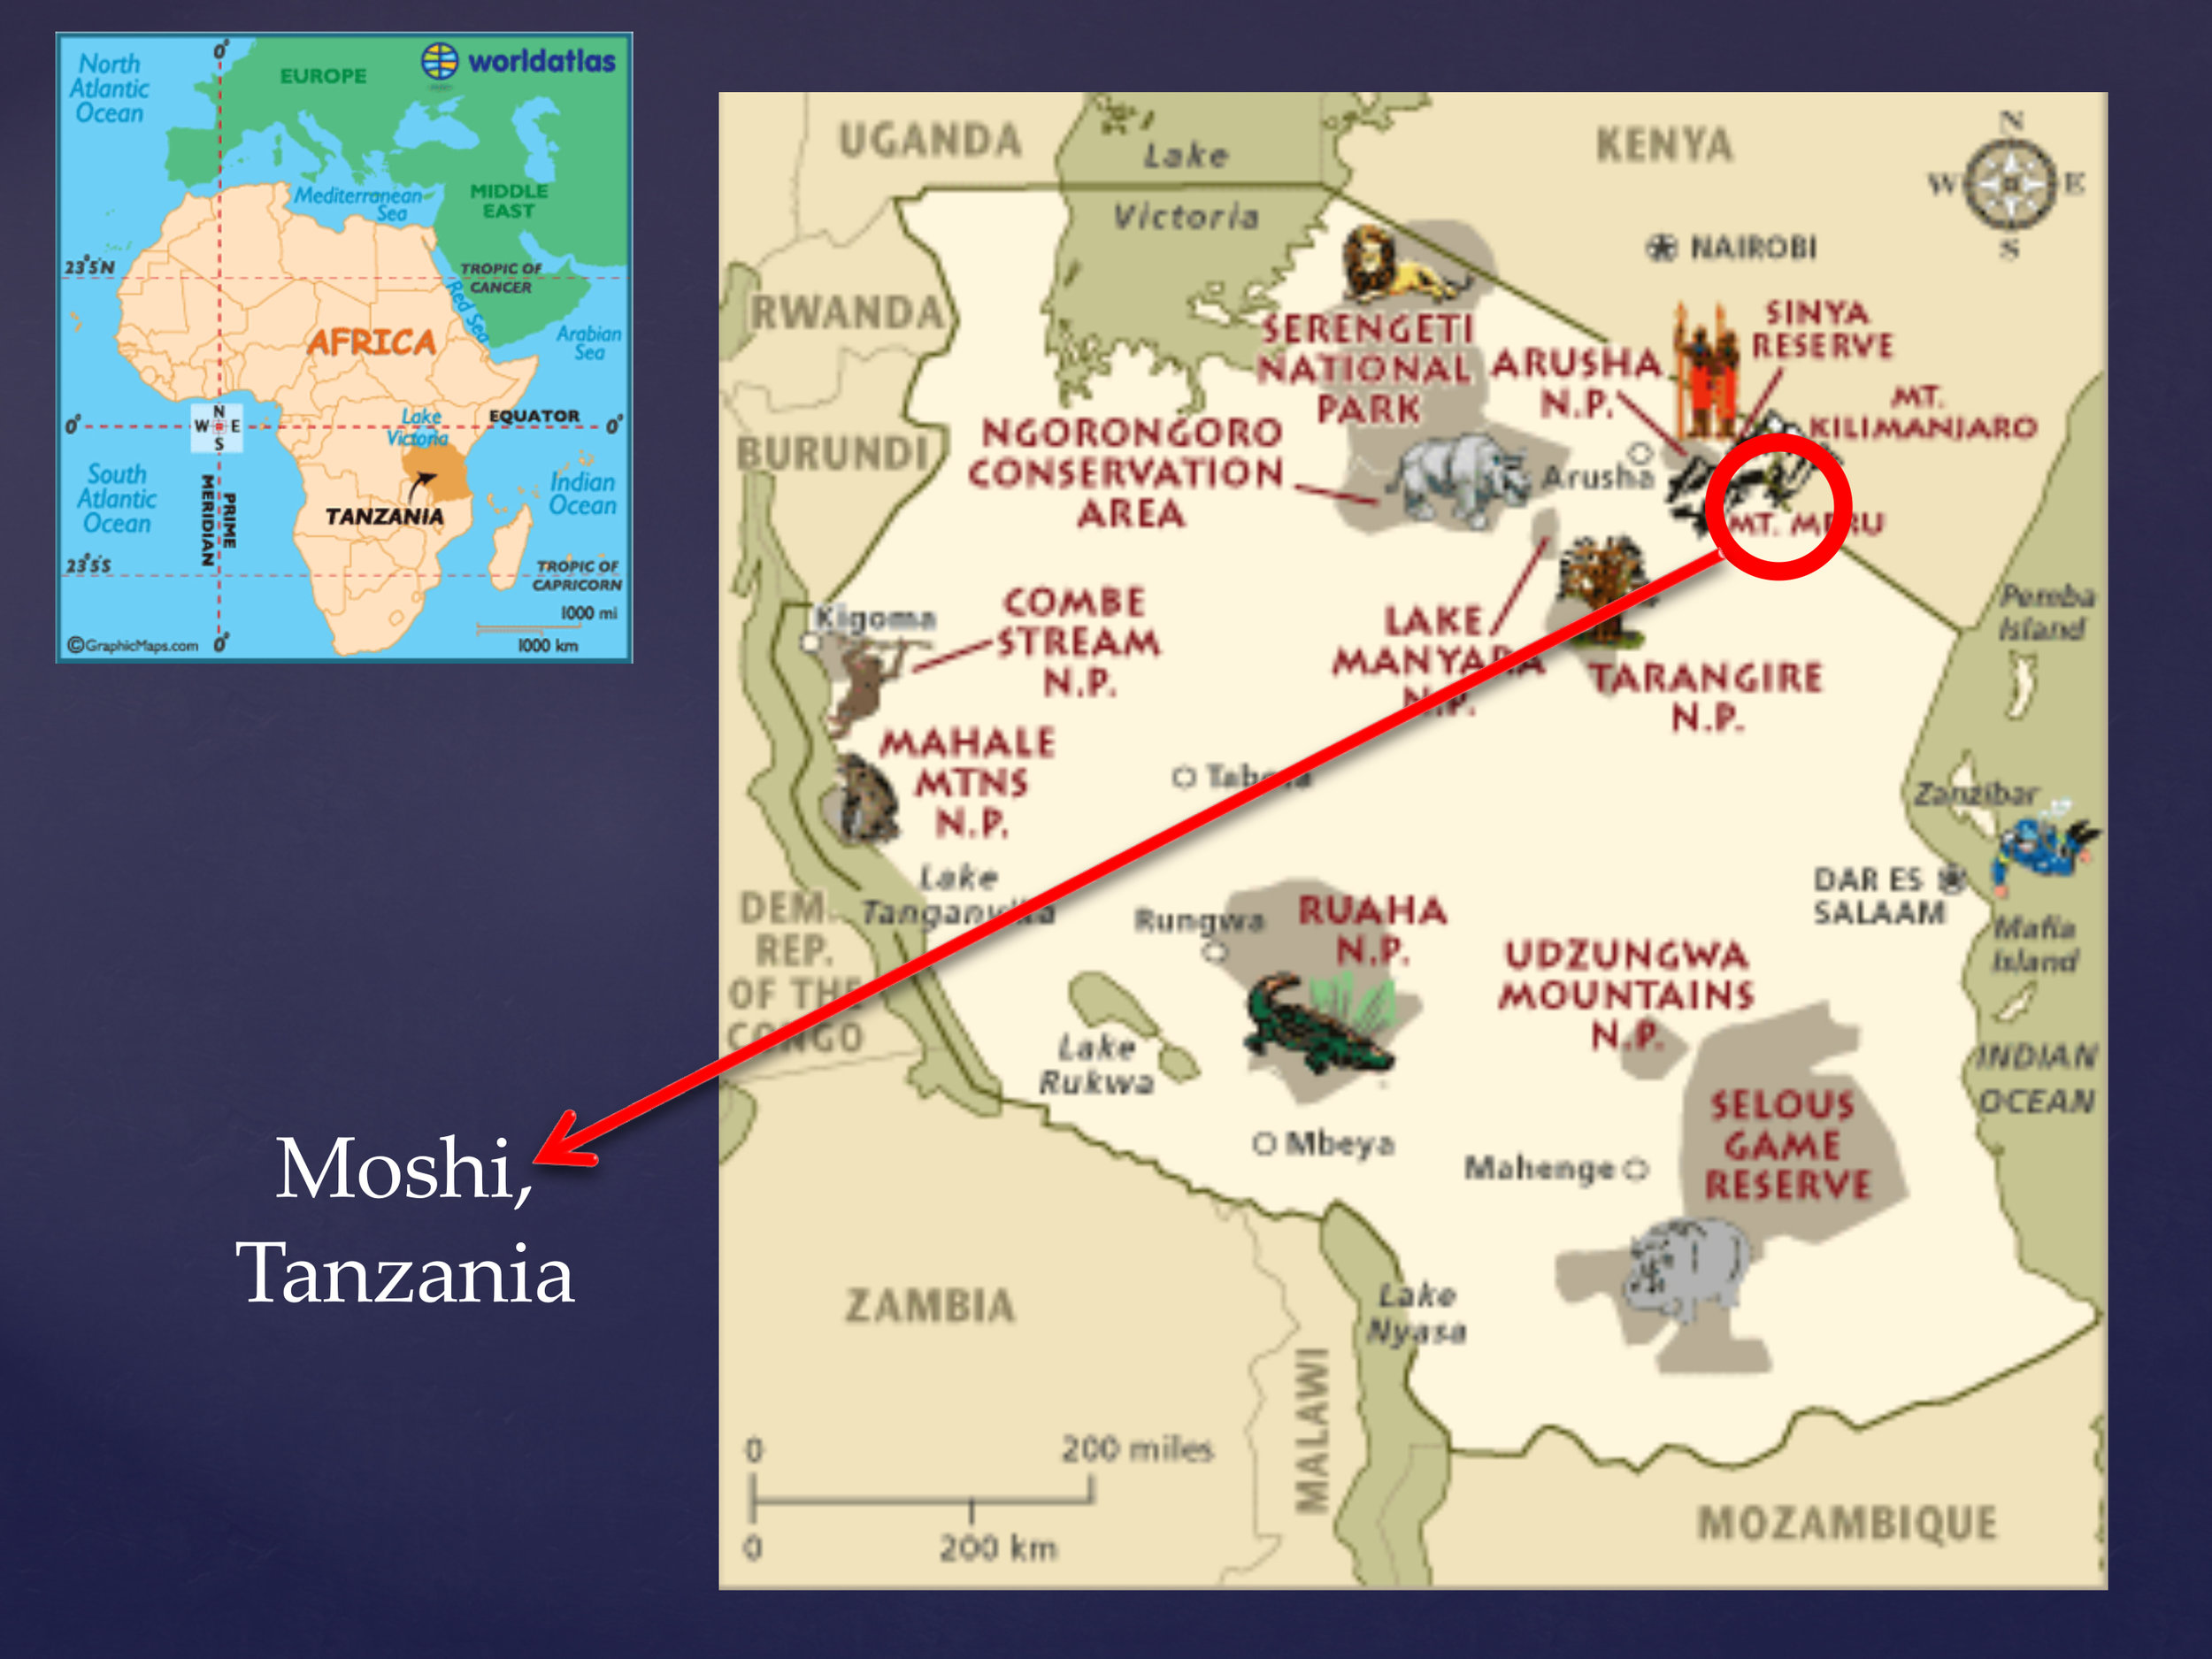 Moshi is nestled near Mt. Kilimanjaro and Mt. Meru, near the Kenyan border.